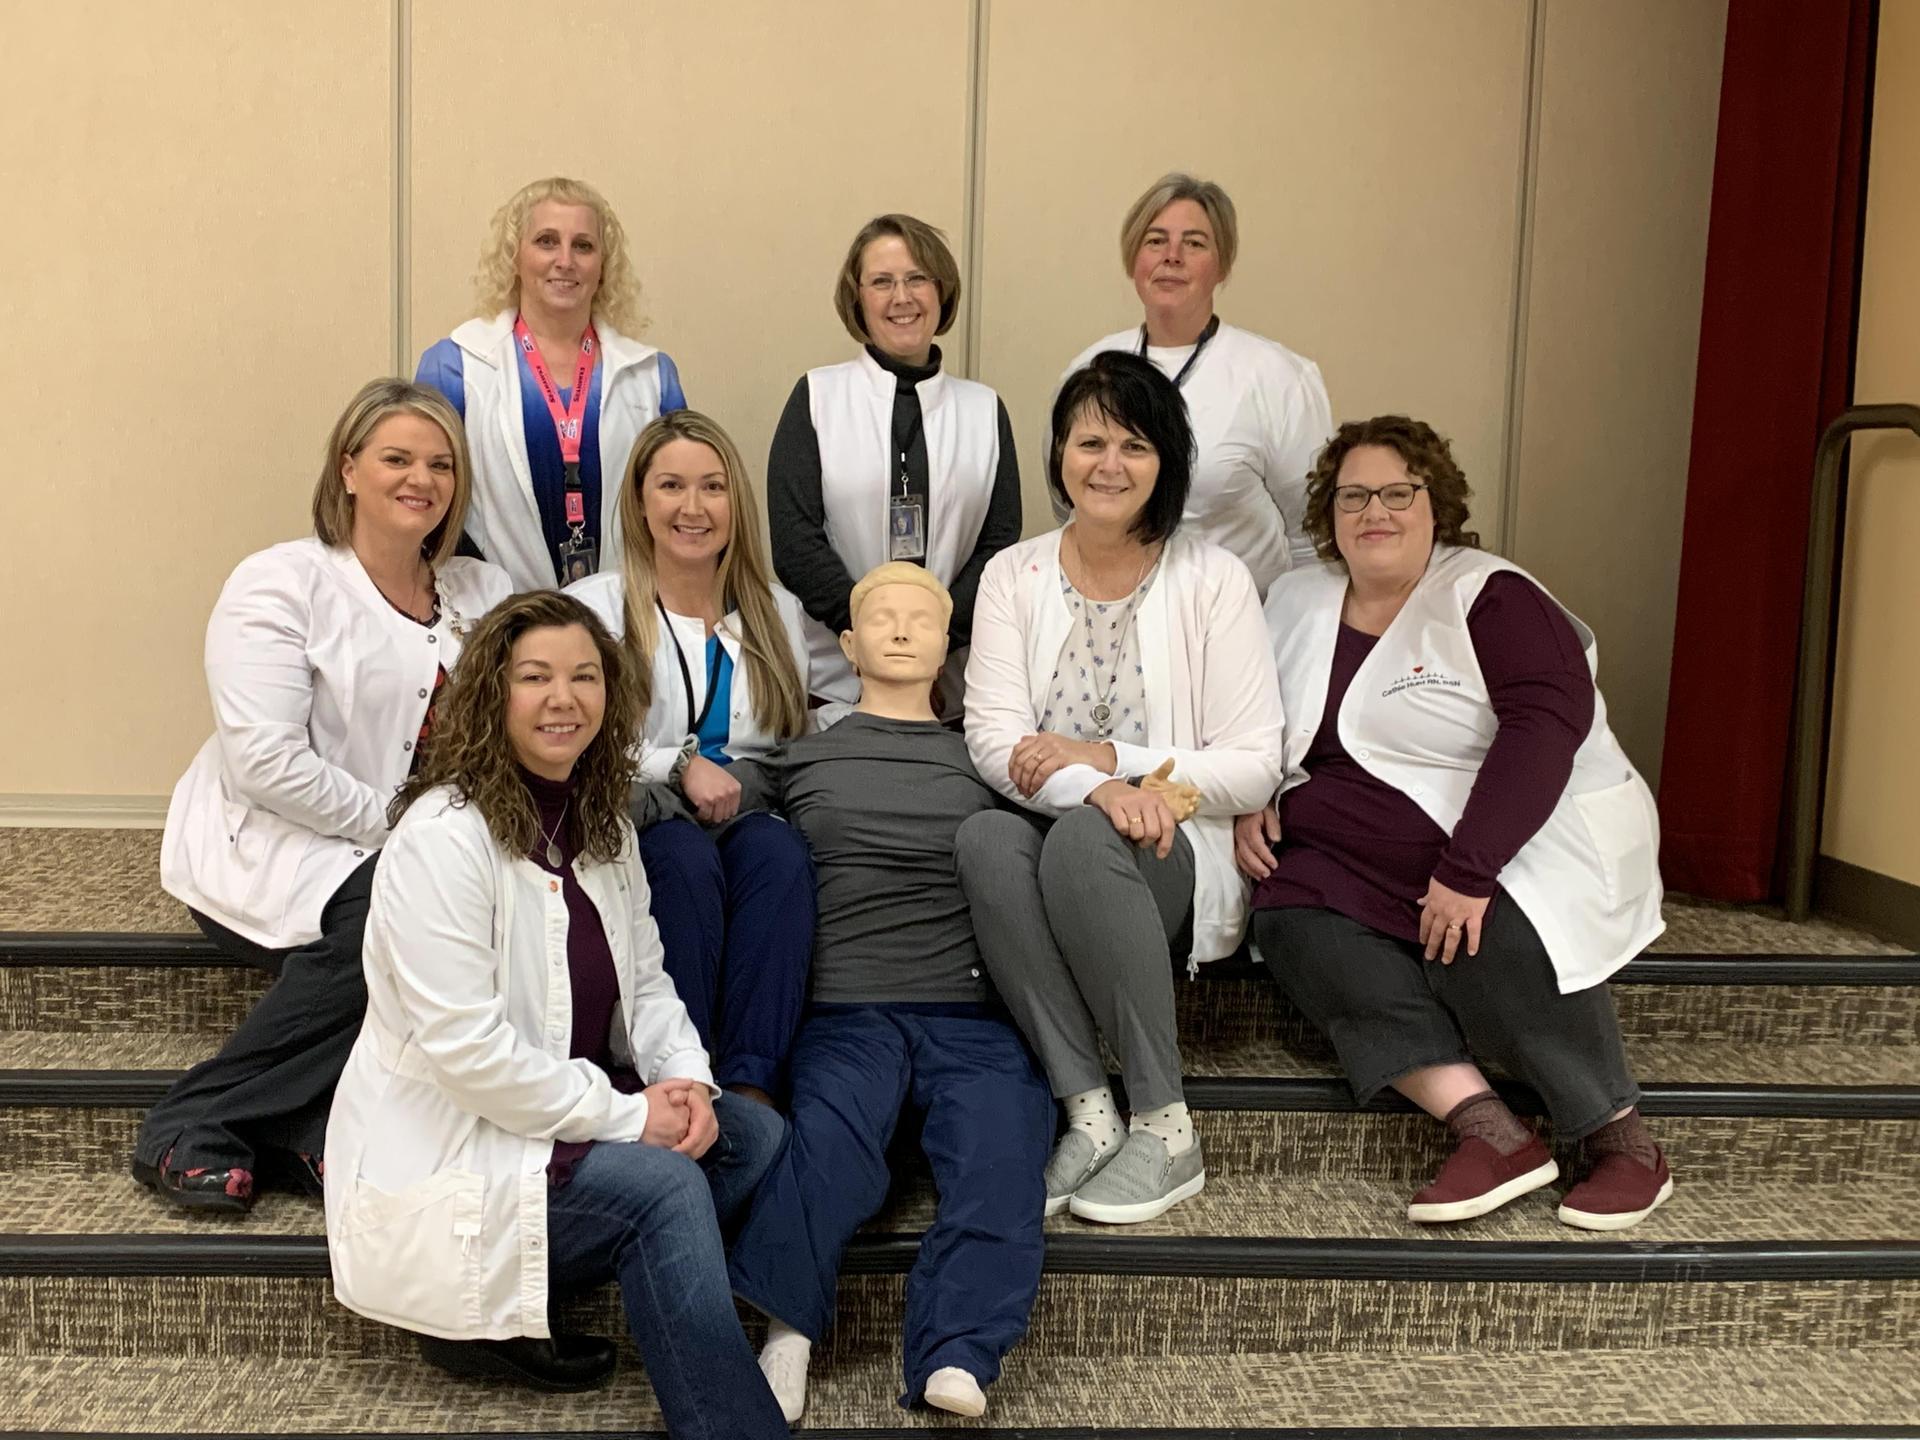 2020 MLSD School Nurses group photo around a medical test dummy.